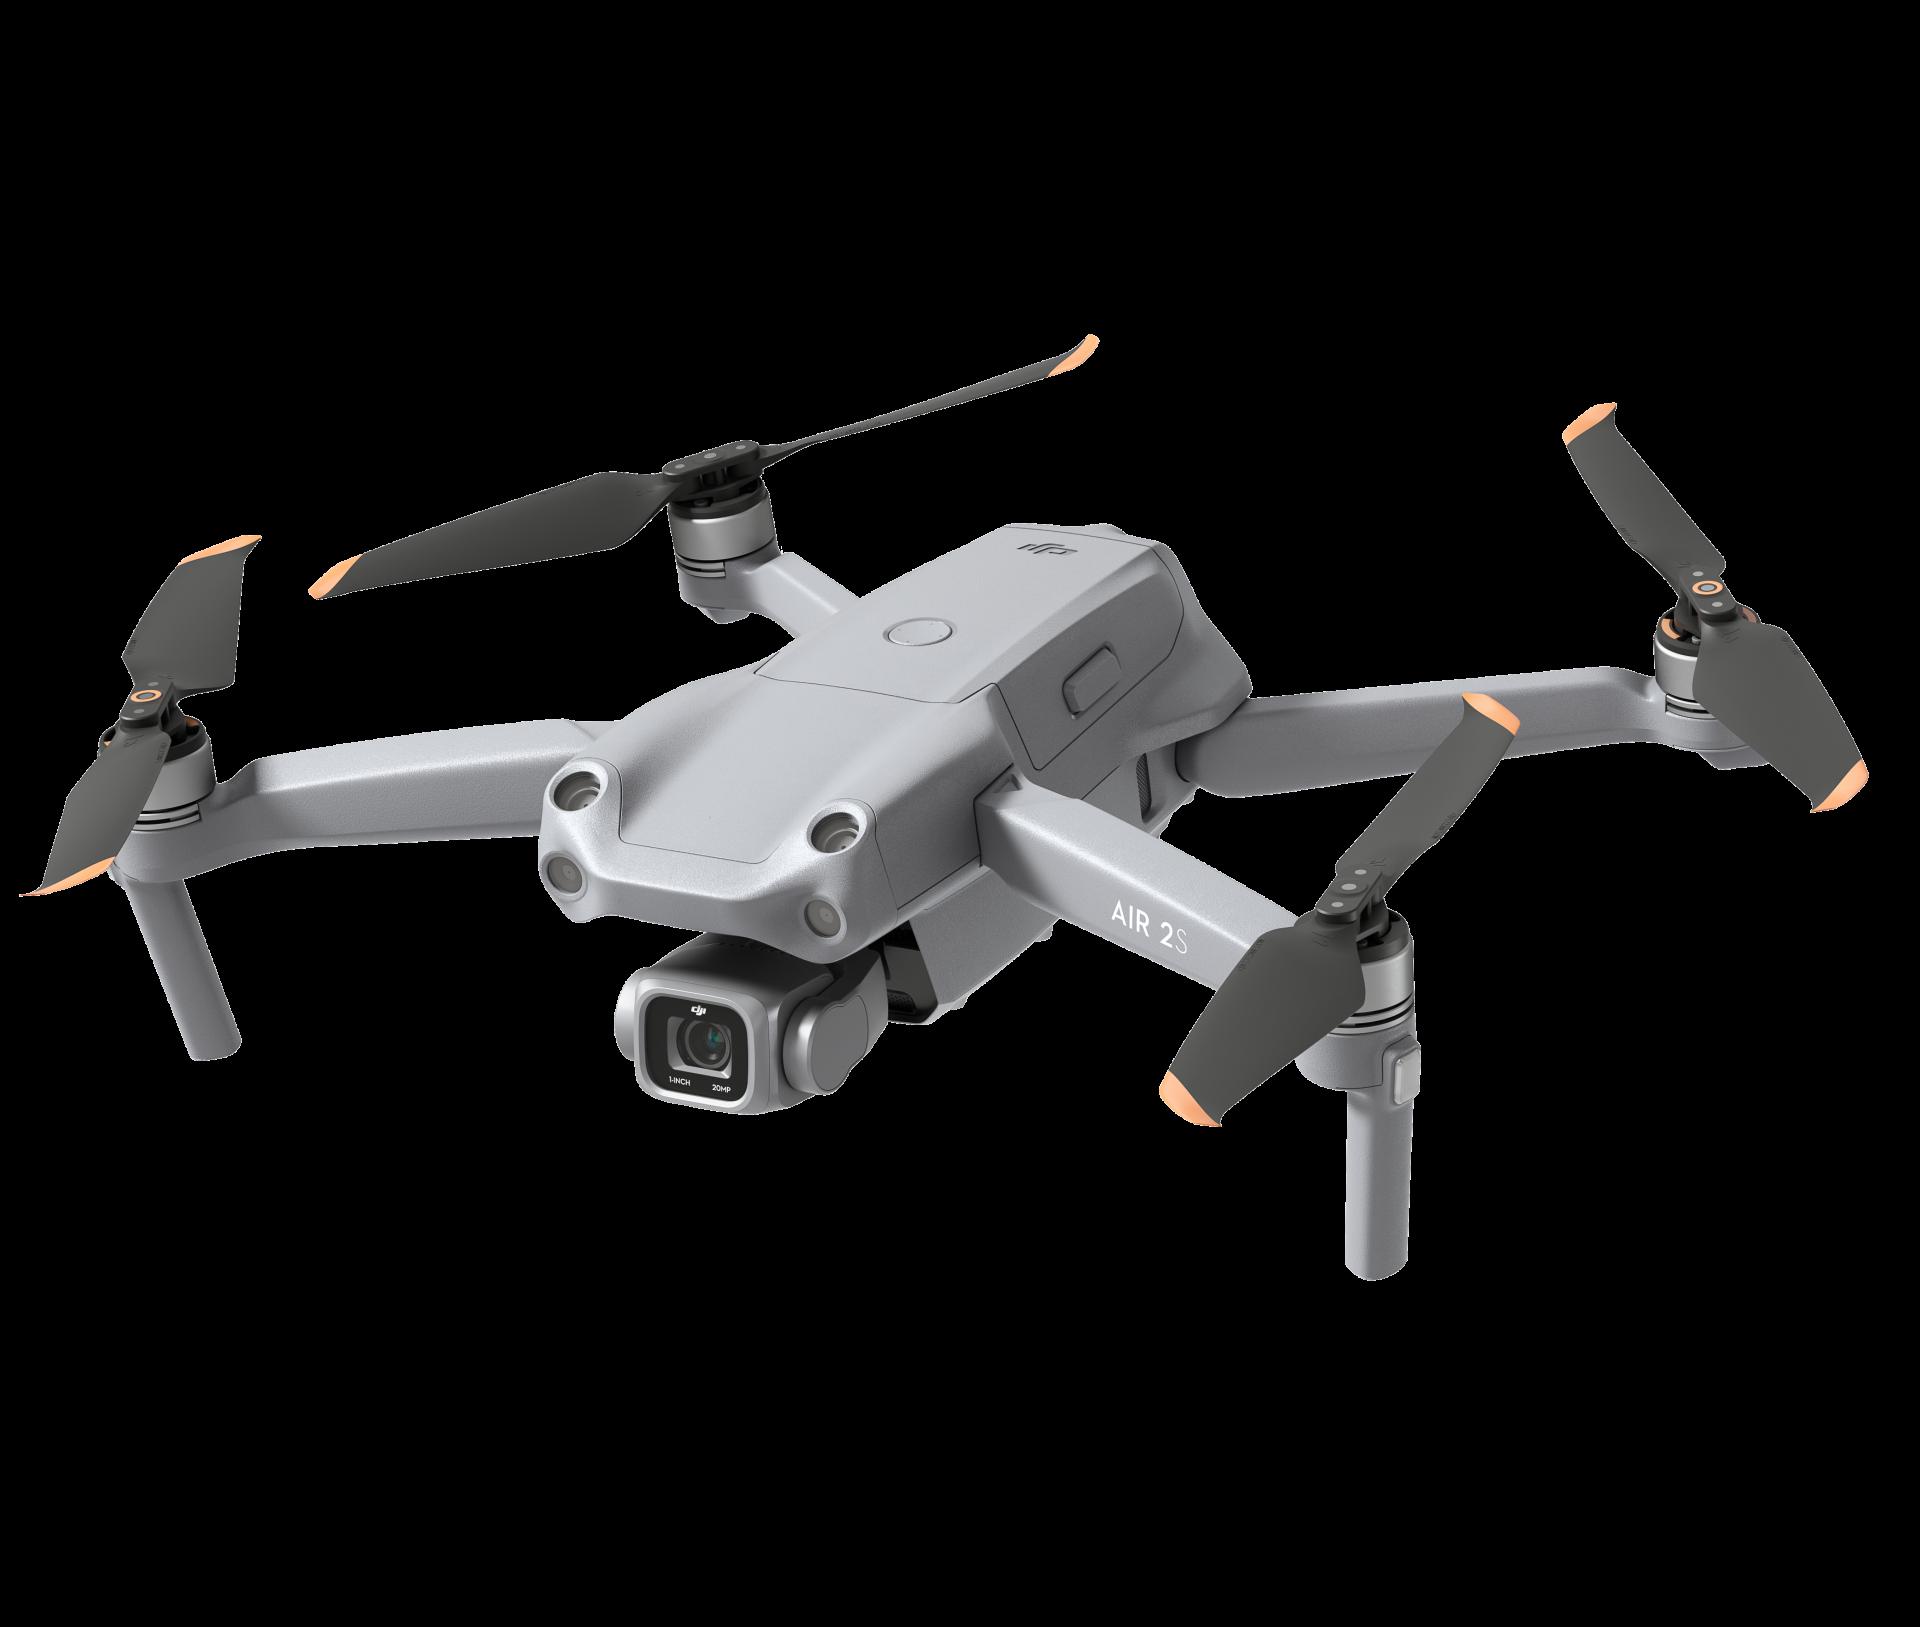 DJI AIR 2S Drone_04